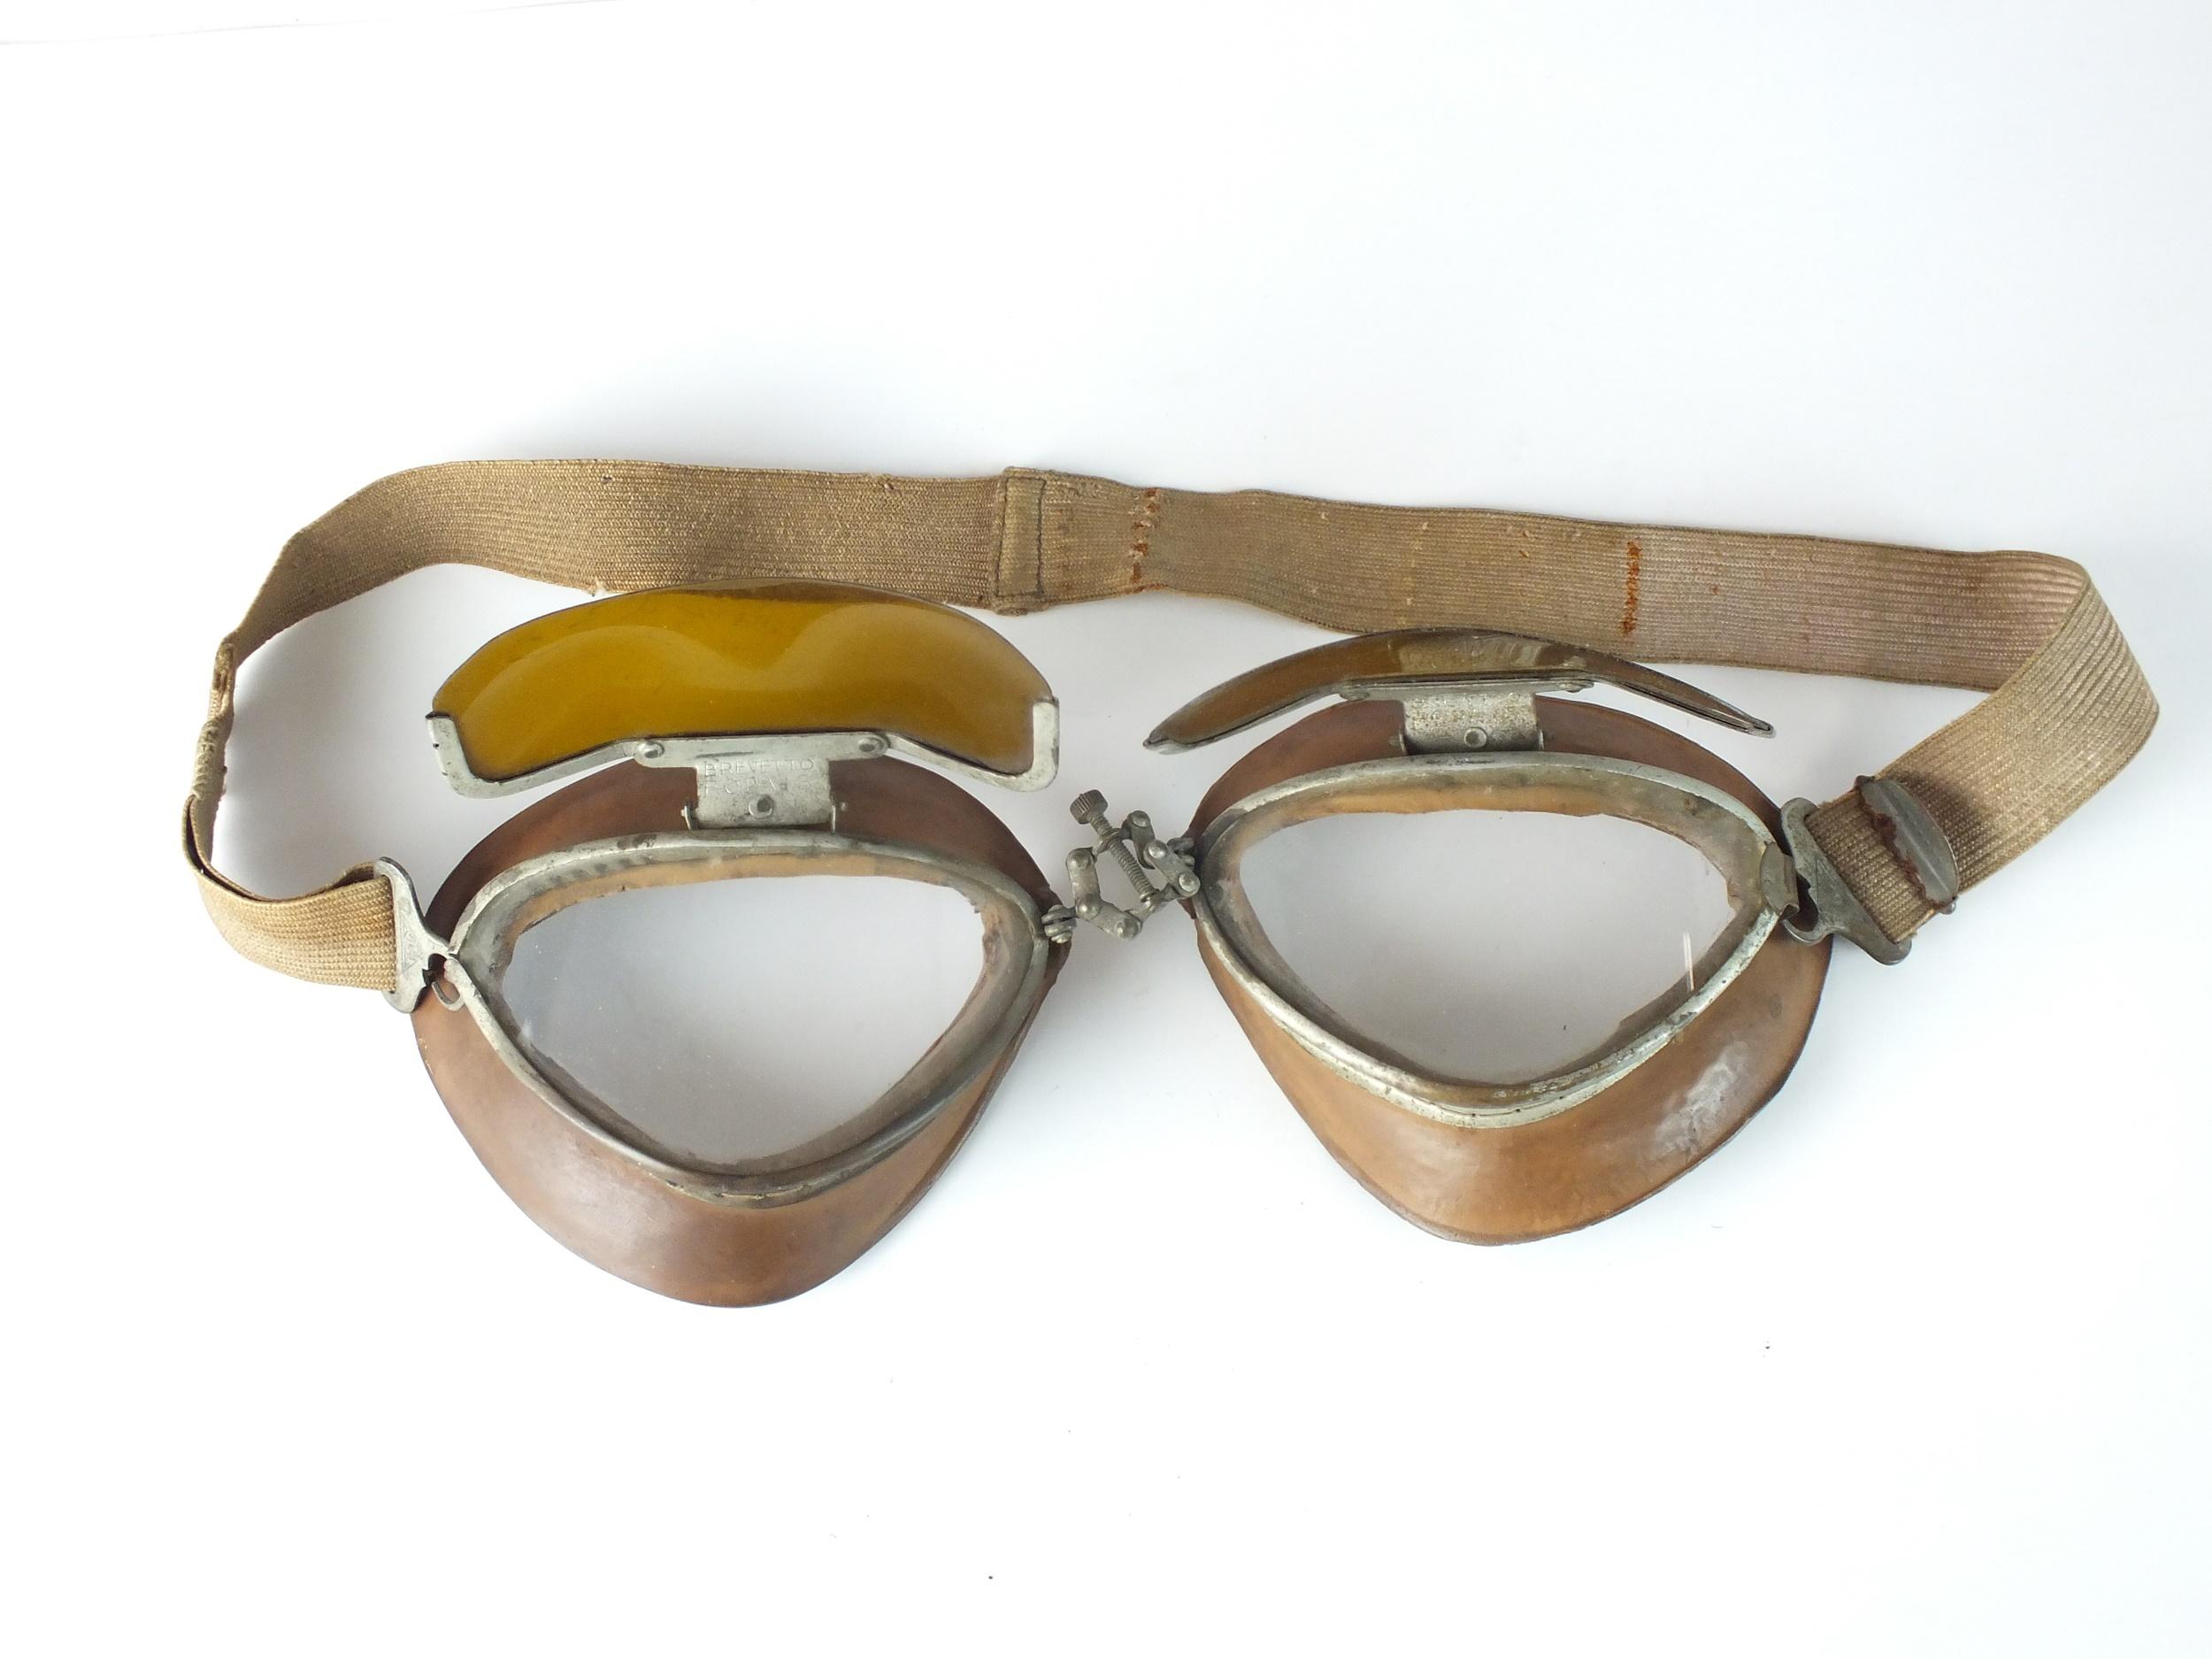 A scarce pair of Second World War Italian Regia Aeronautica flying goggles by Brevetto Fopais, - Image 2 of 3